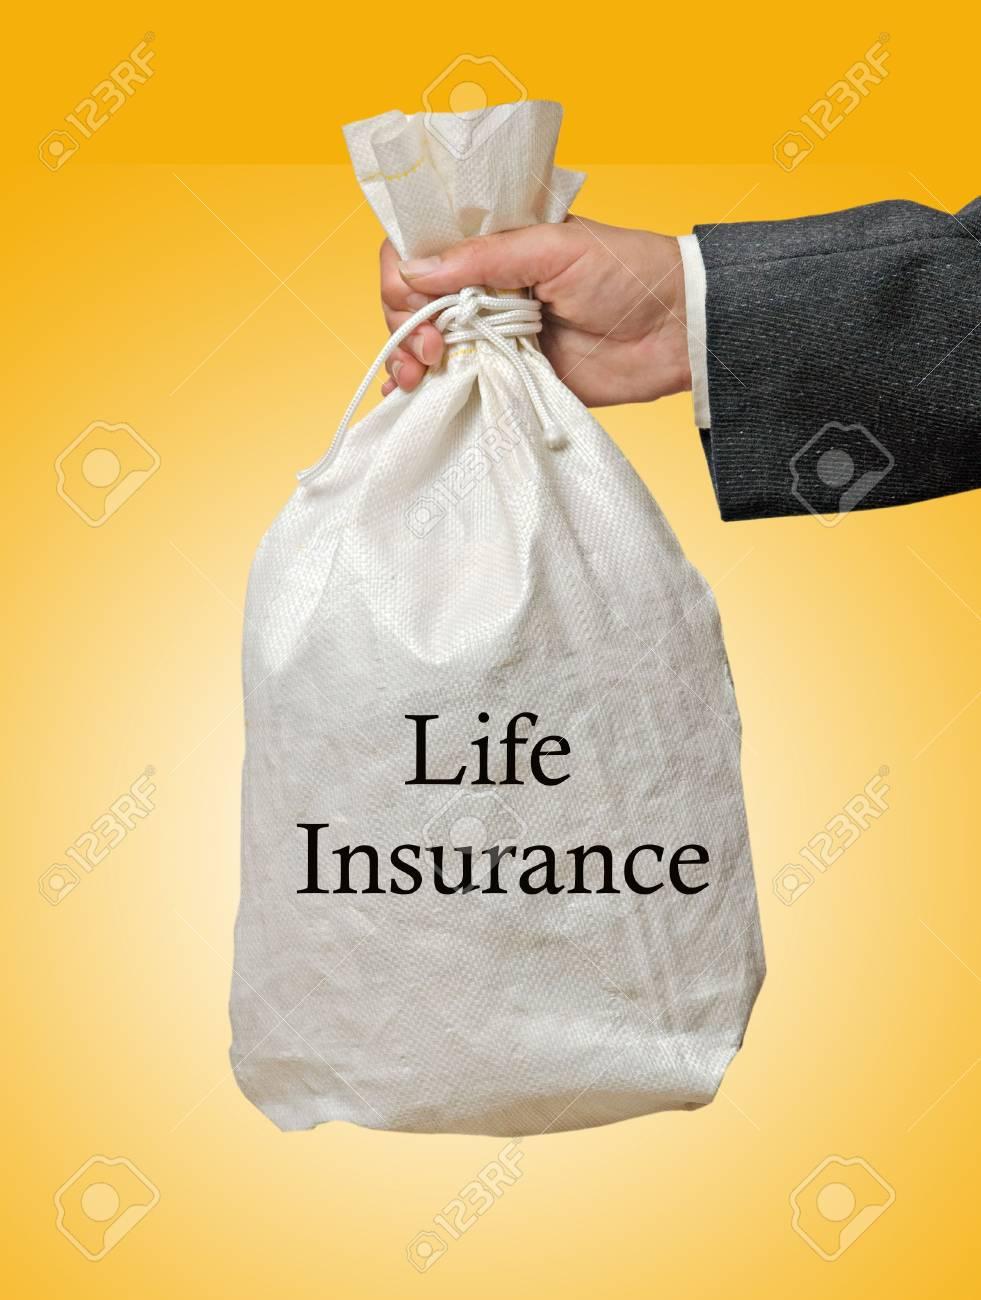 Giving life insurance Stock Photo - 6819409